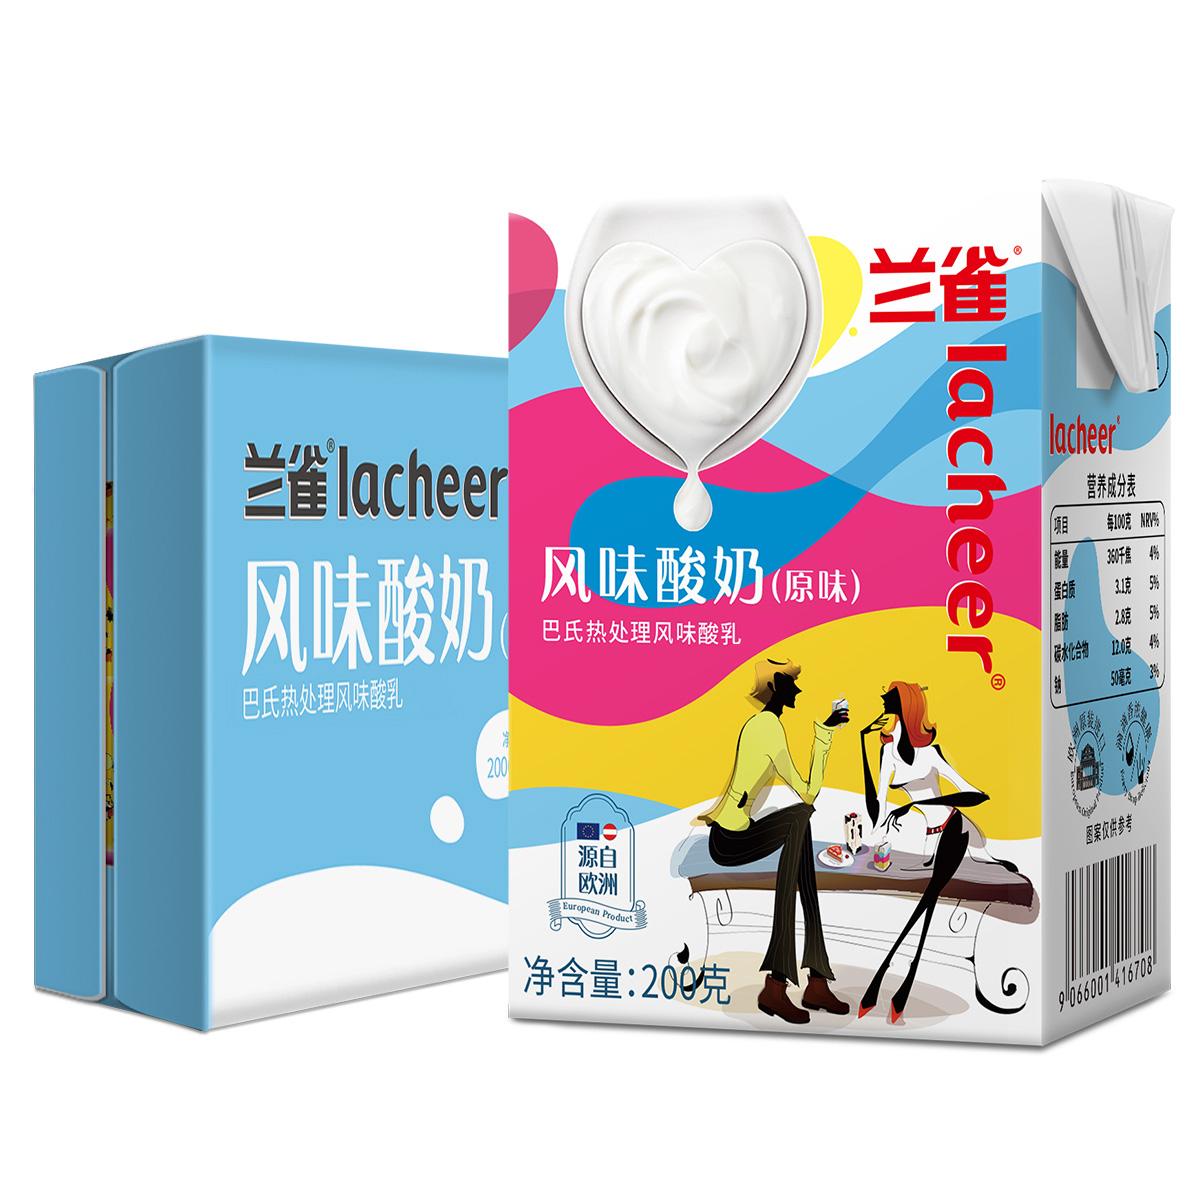 Laciate 兰雀 常温原味酸奶 200g*24/箱 *4件